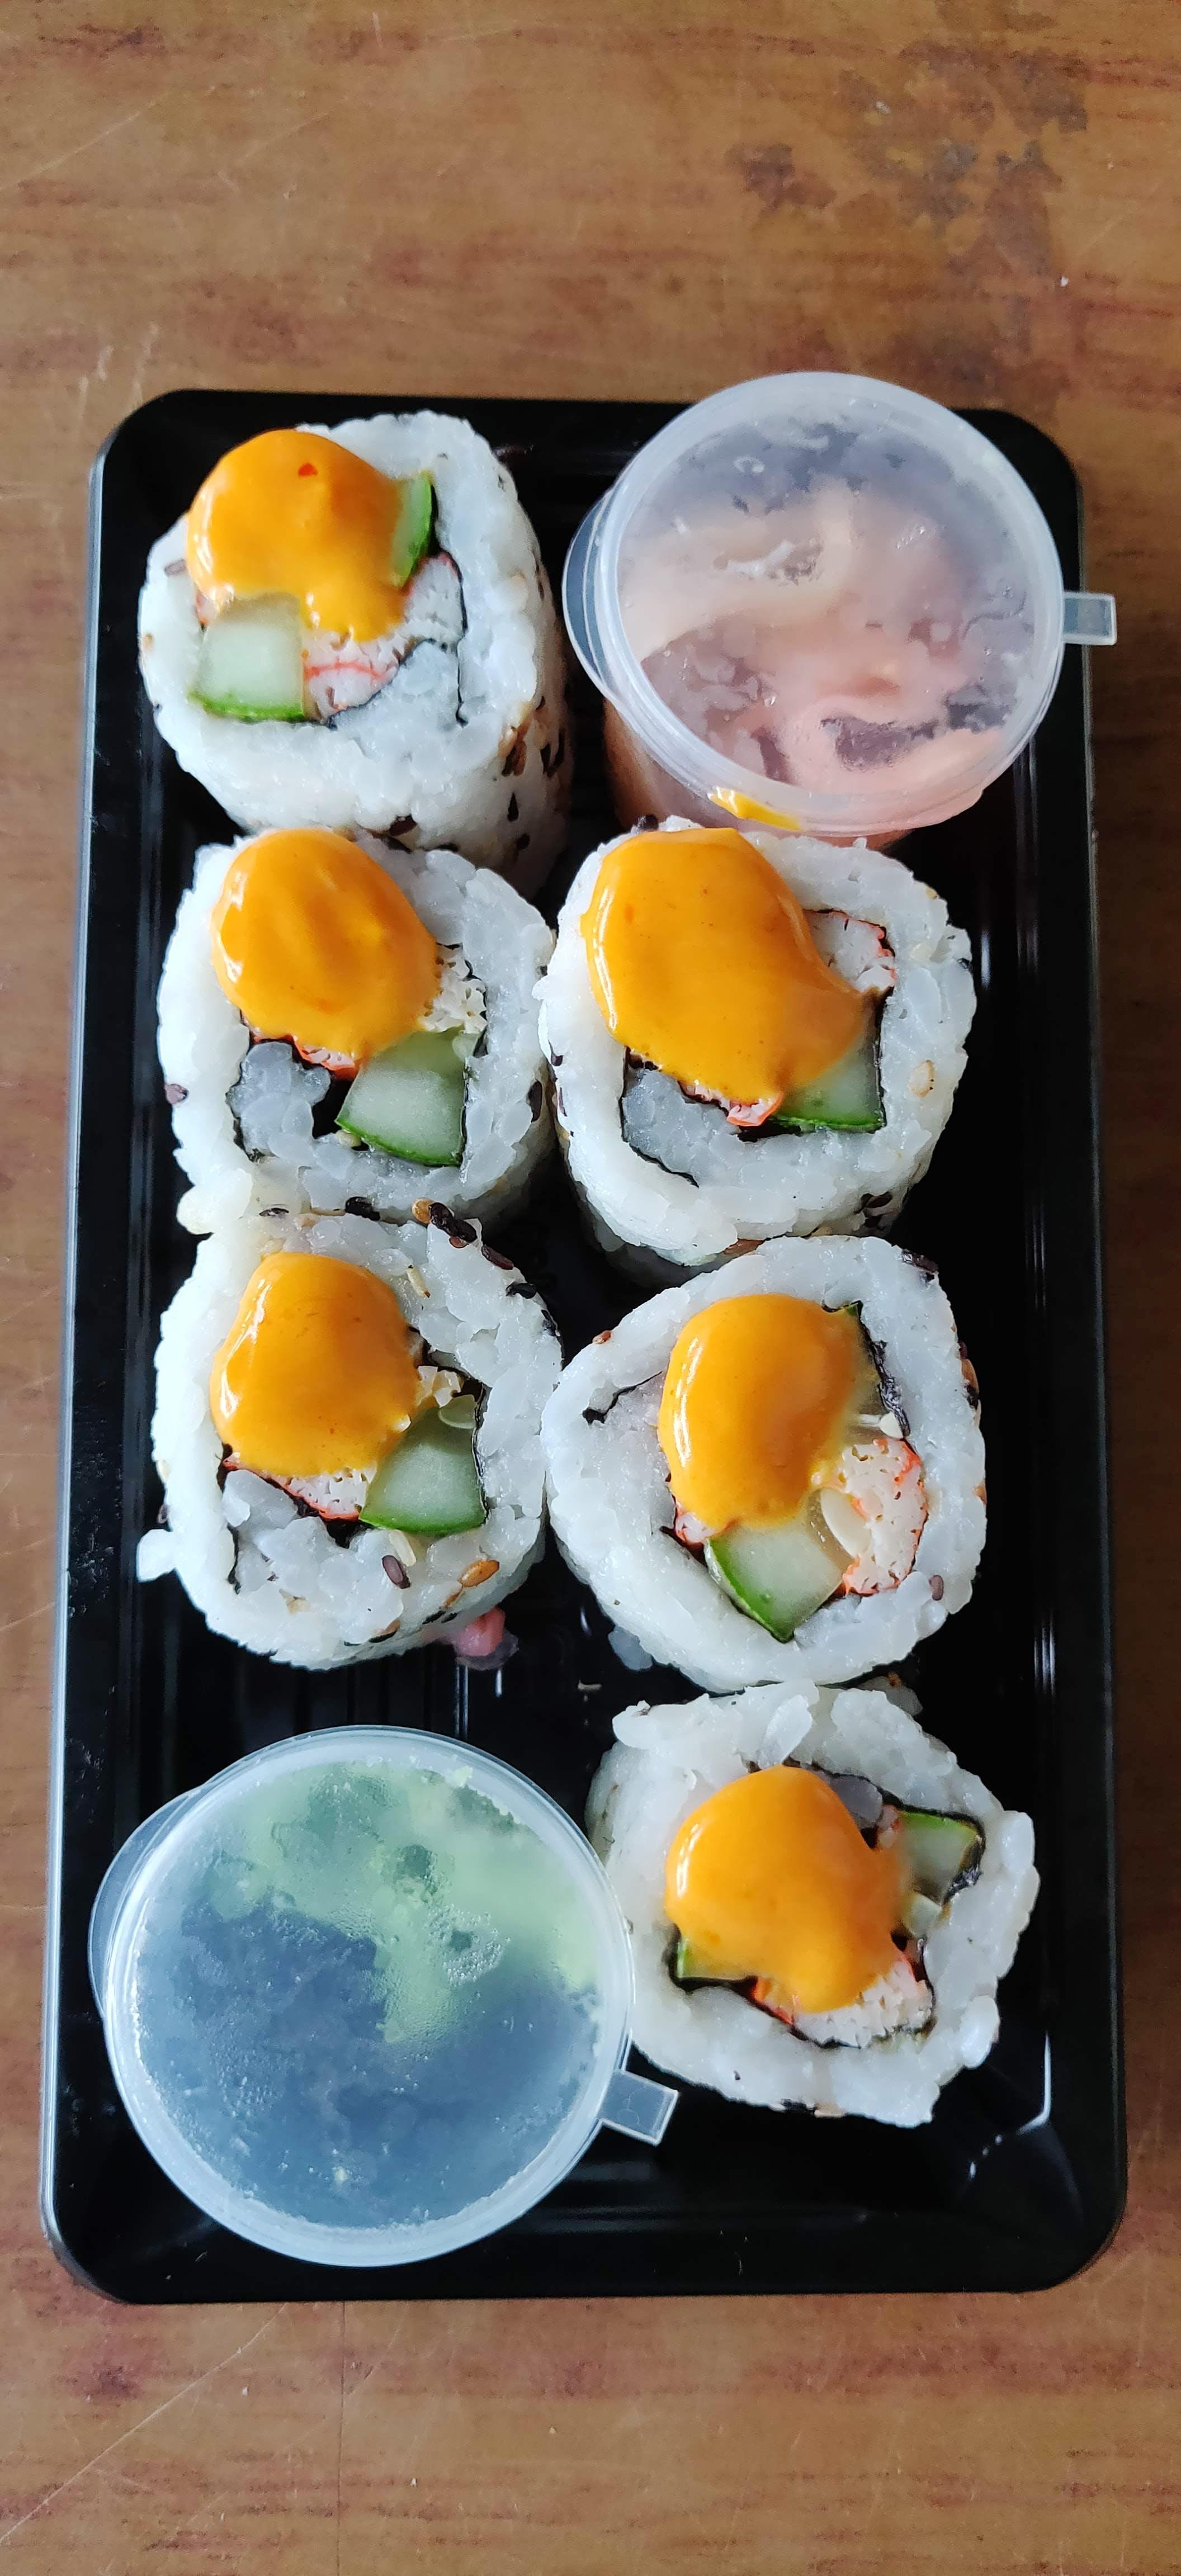 Dish,Food,Cuisine,Ingredient,Comfort food,Egg,Steamed rice,Meal,Breakfast,Gimbap